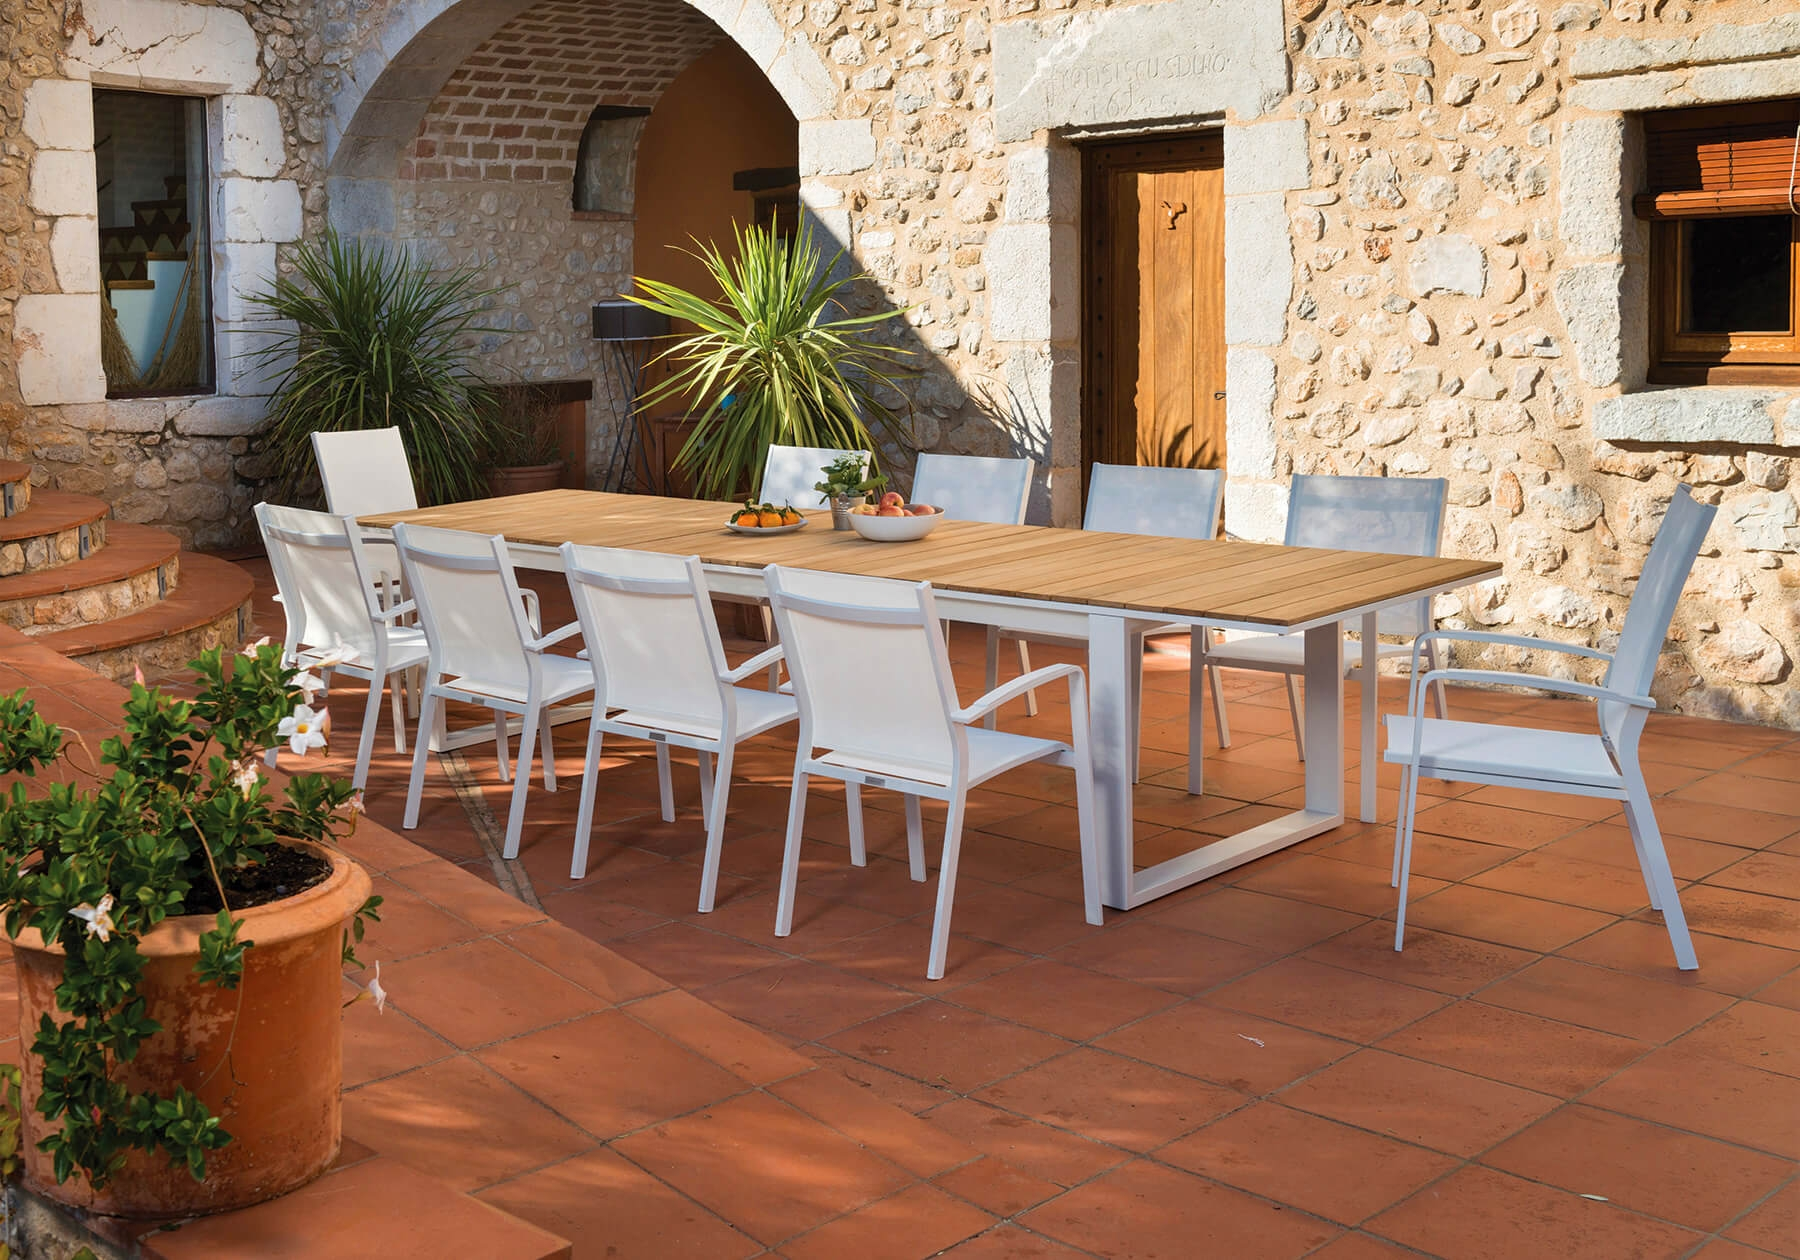 Grande table de jardin extensible en aluminium et teck de la ...